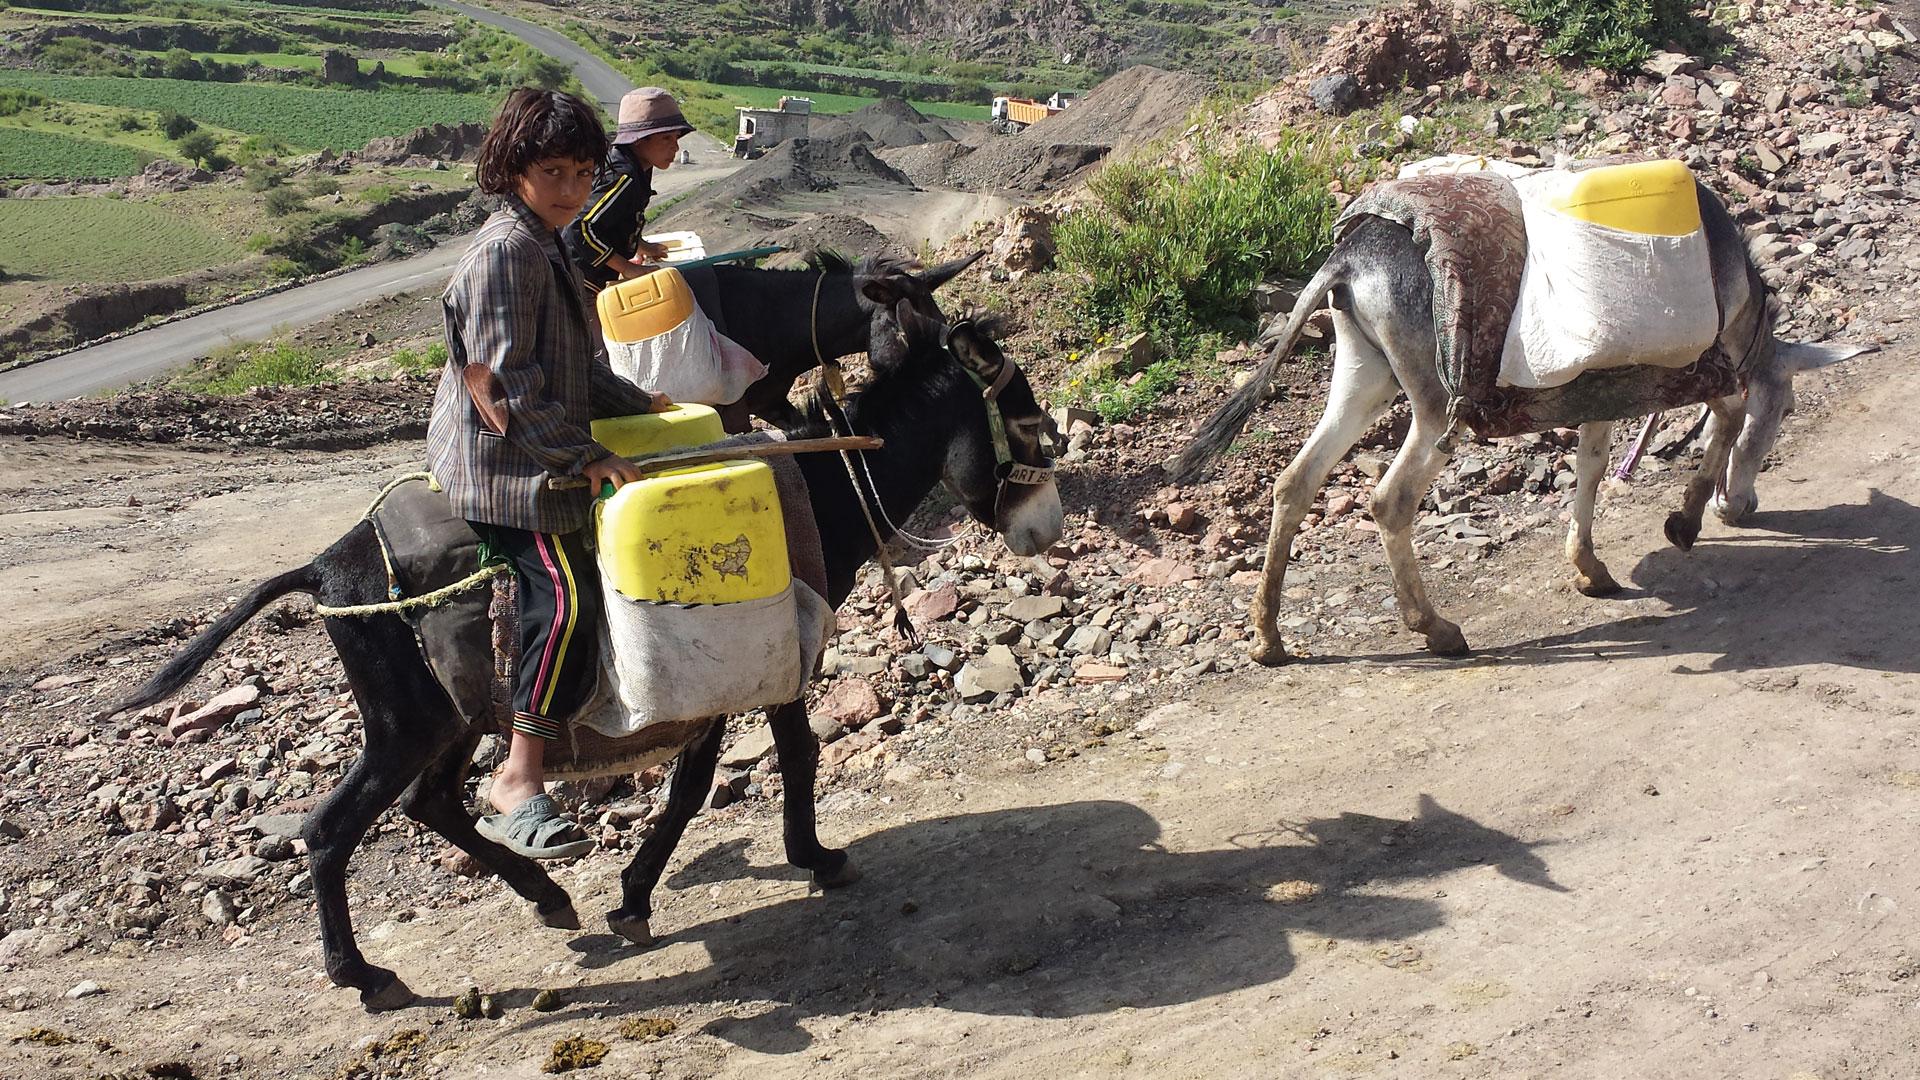 Hilfe im Jemen